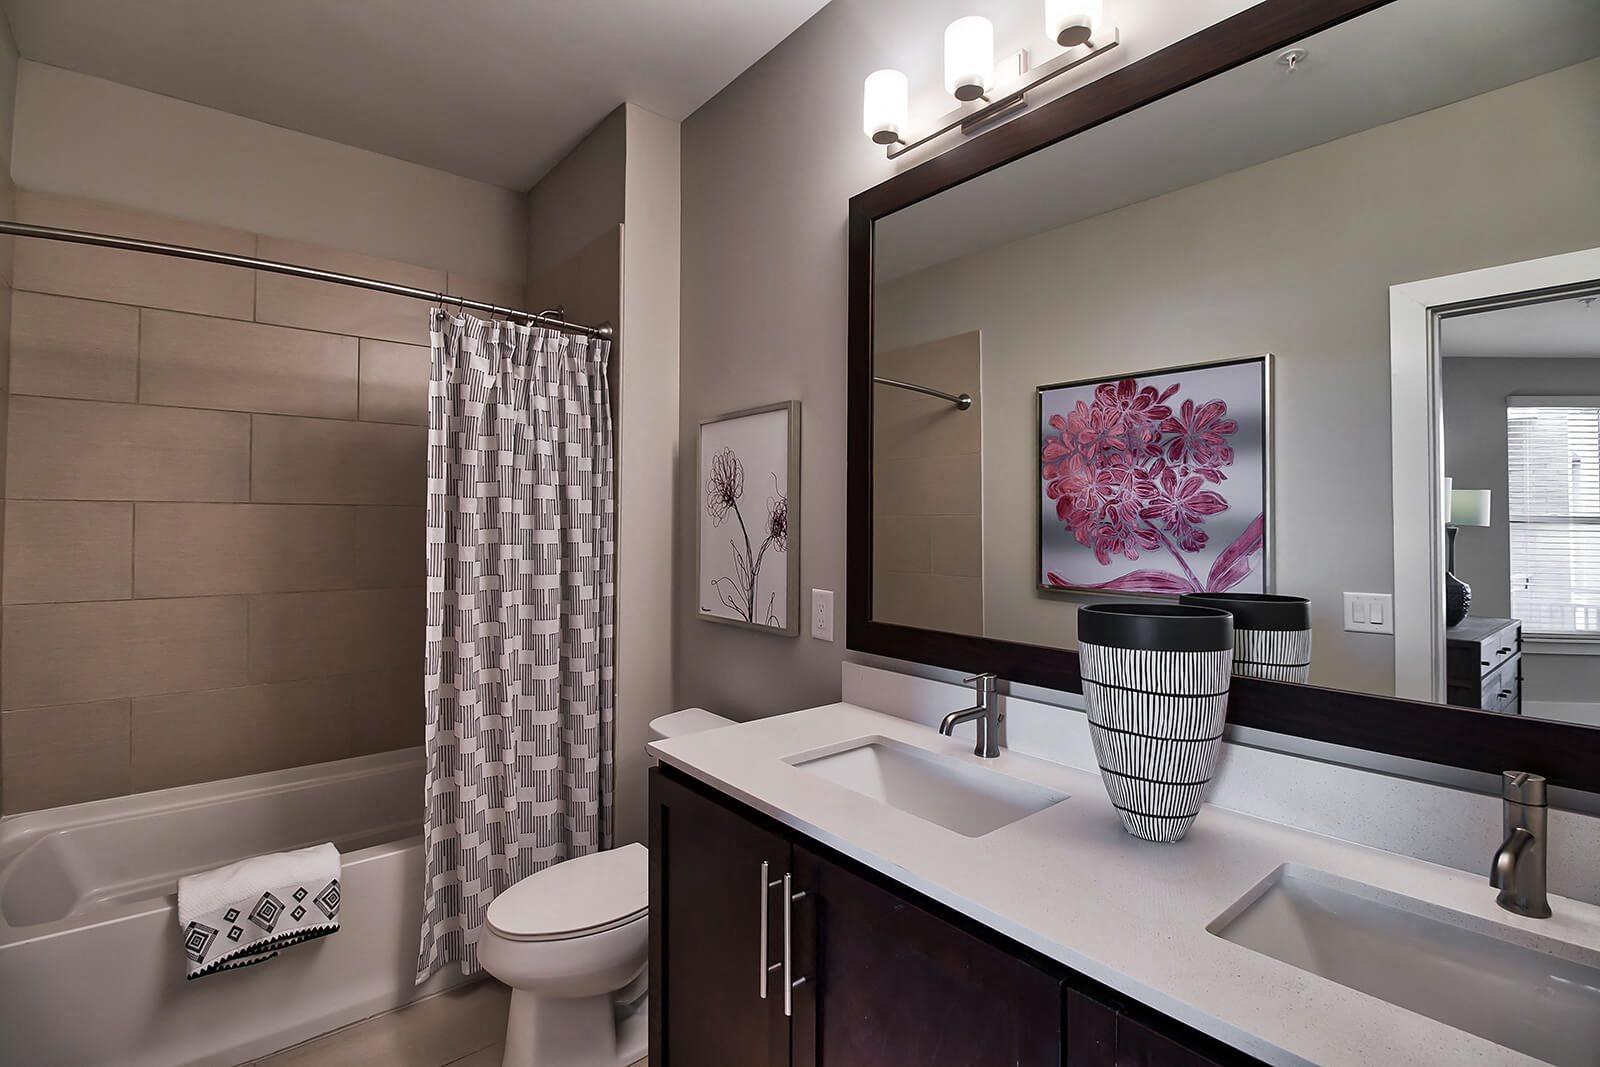 Dual Vanities and Large Soaking Tubs at Morningside Atlanta by Windsor, Atlanta, GA